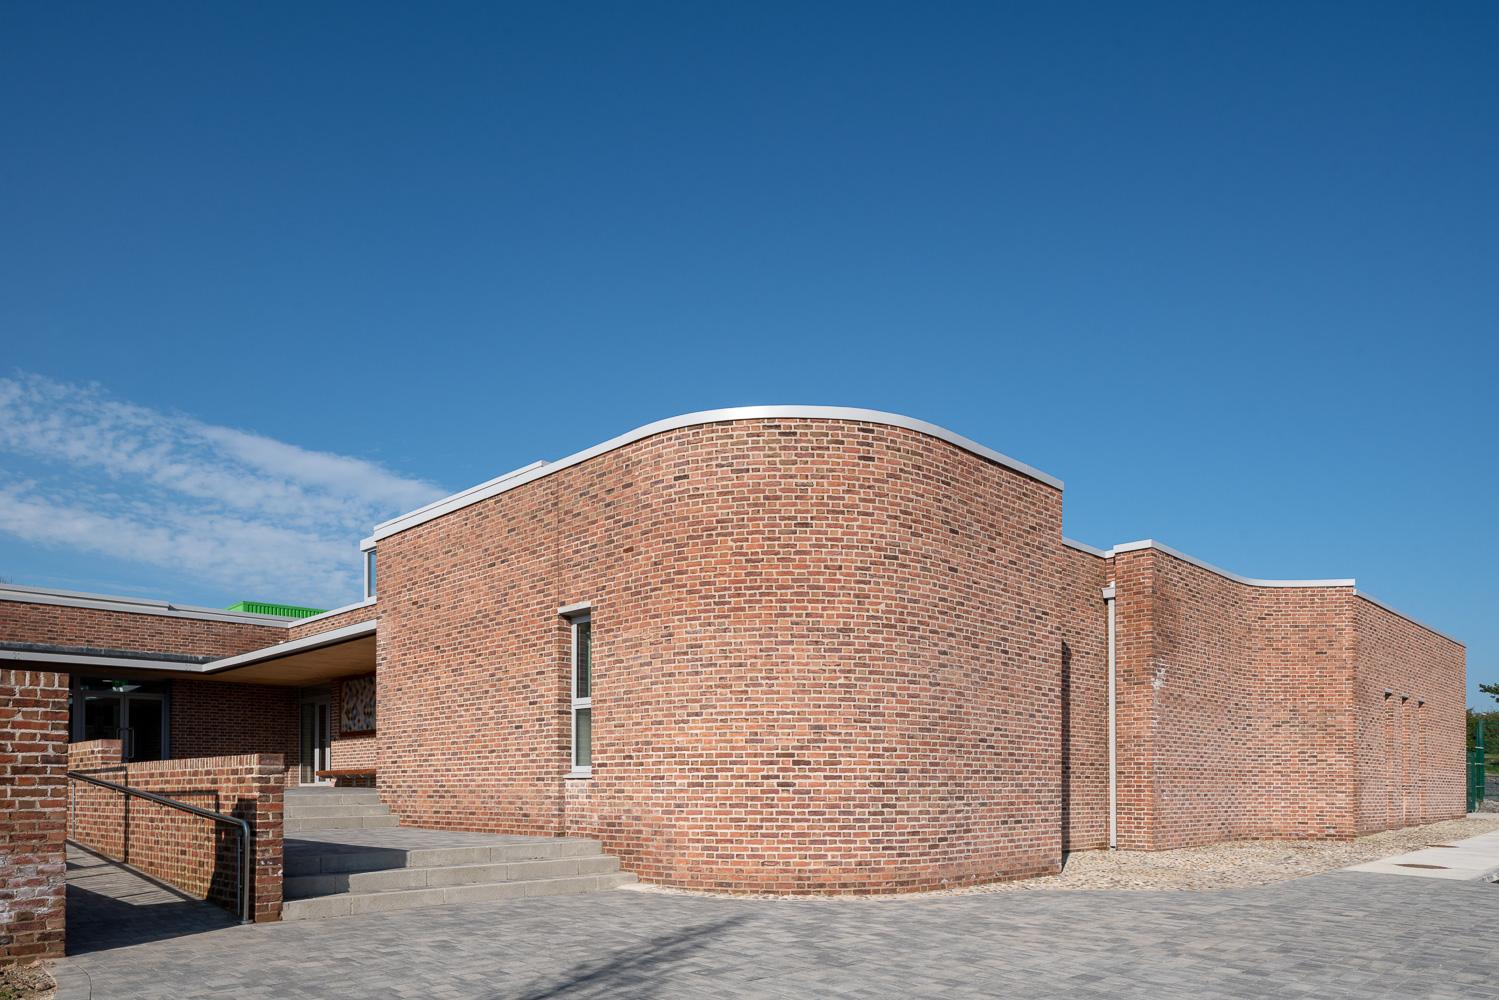 Entrance Atrium for entire school community